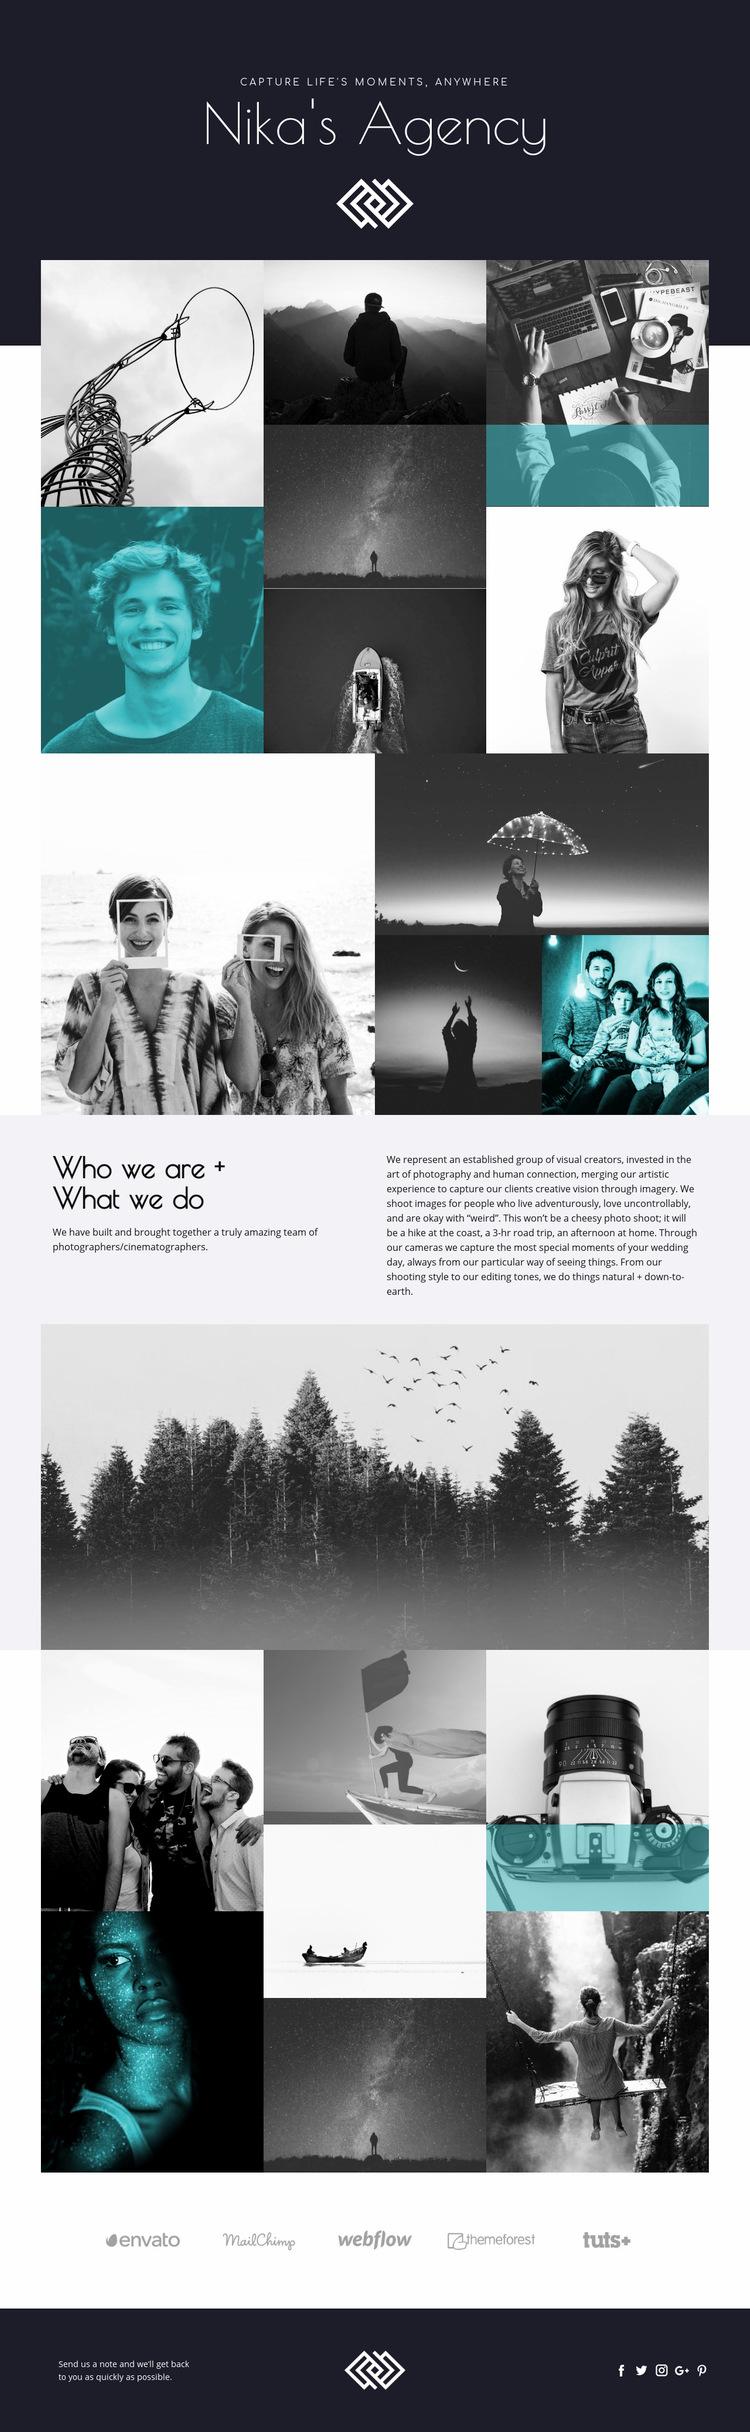 Nika's Agency Web Page Design